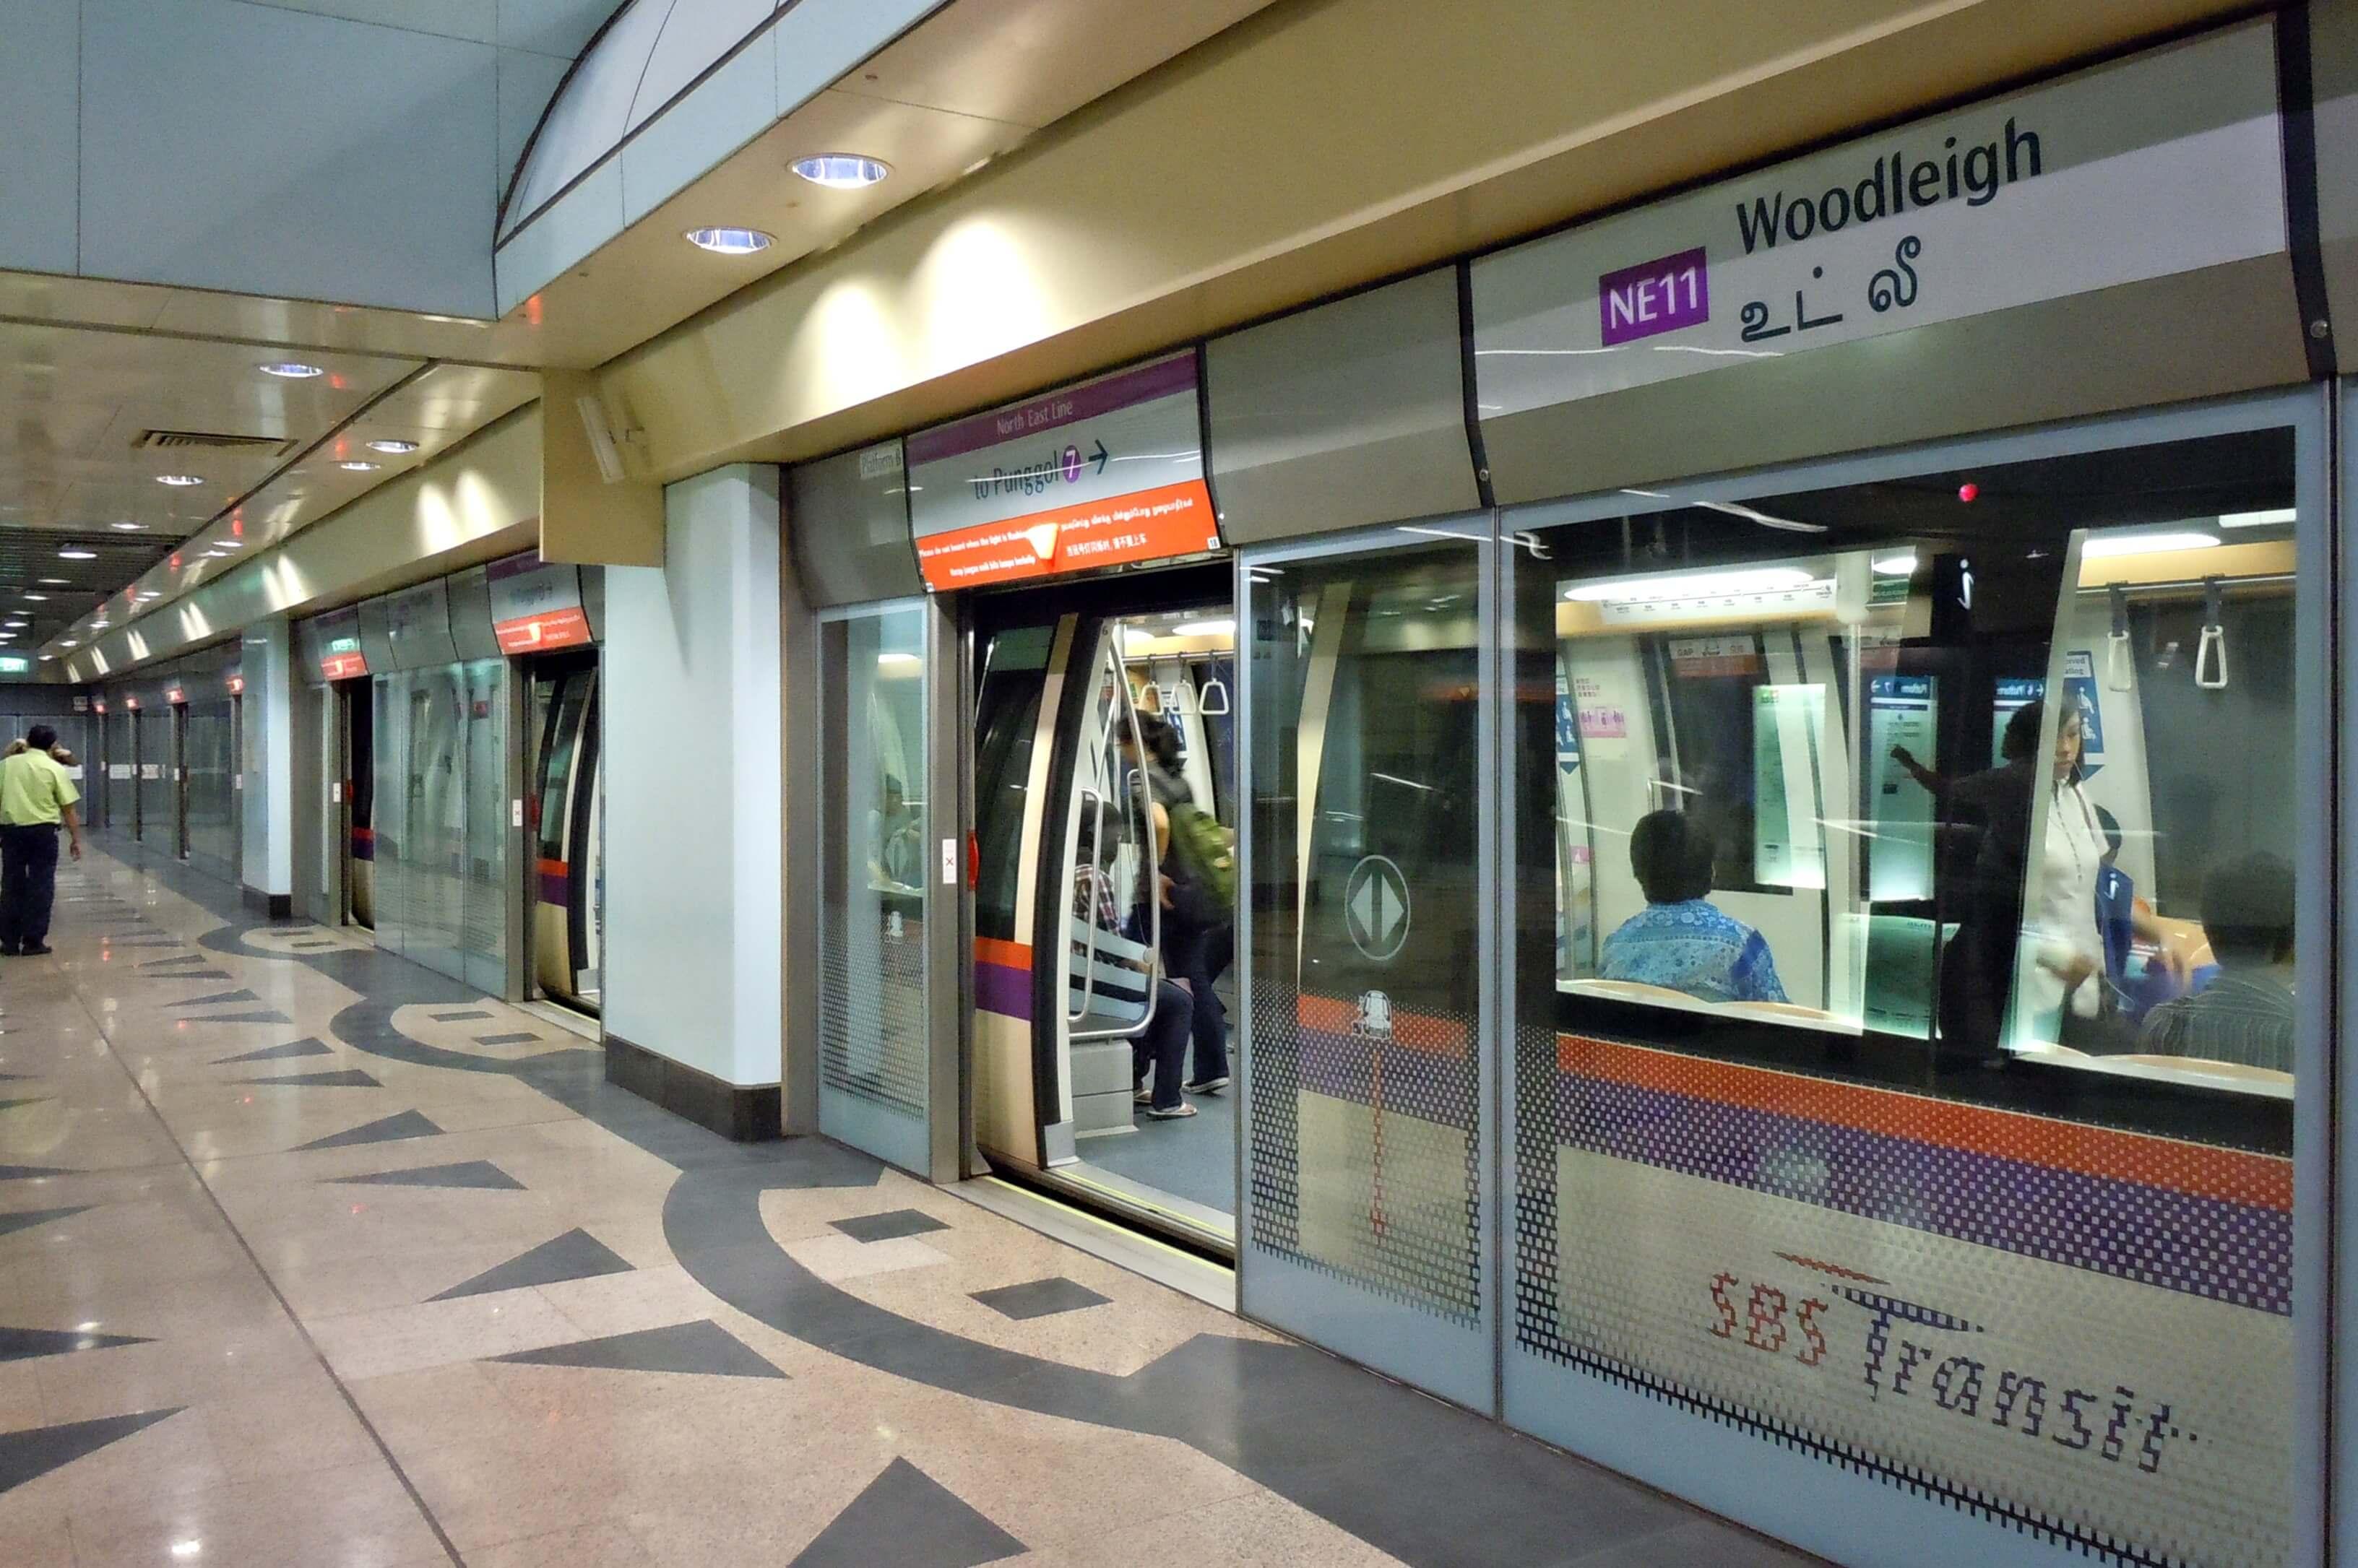 woodleigh mrt station singapore